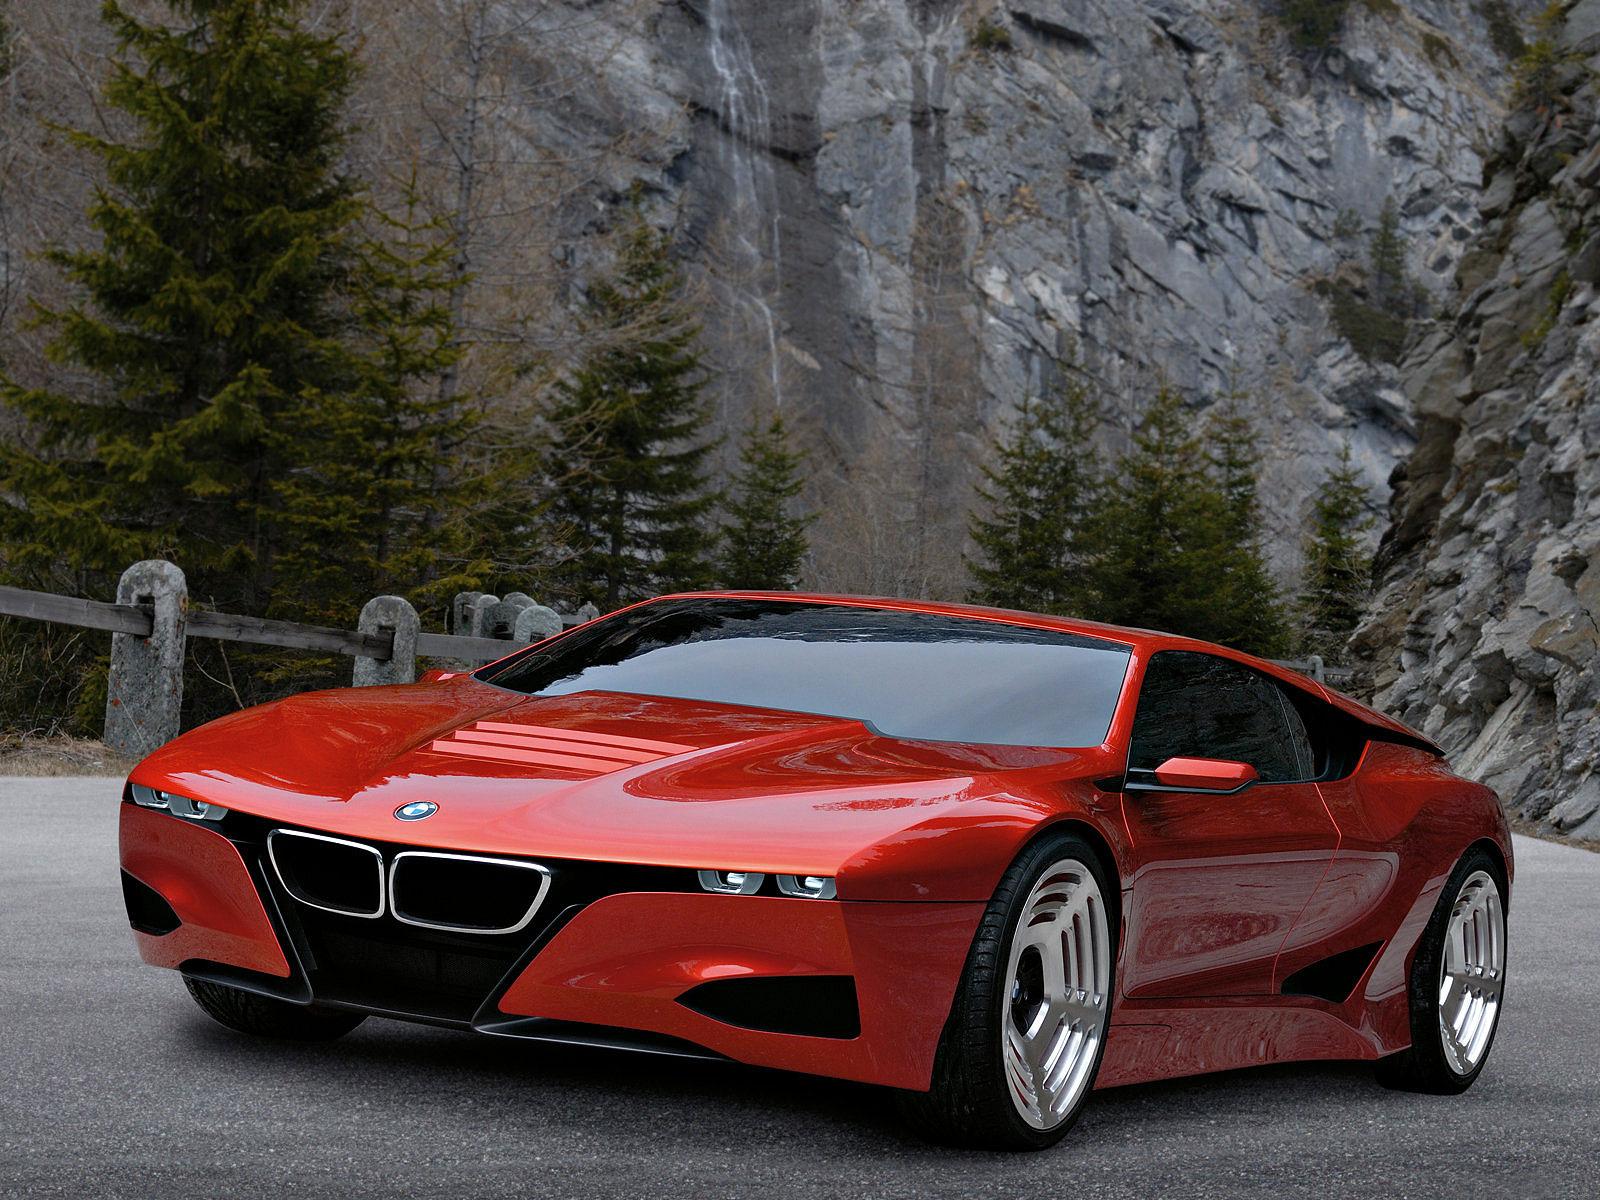 Wallpaper Mobil Sport Bmw: BMW M1 Concept 2008 Gambar Mobil